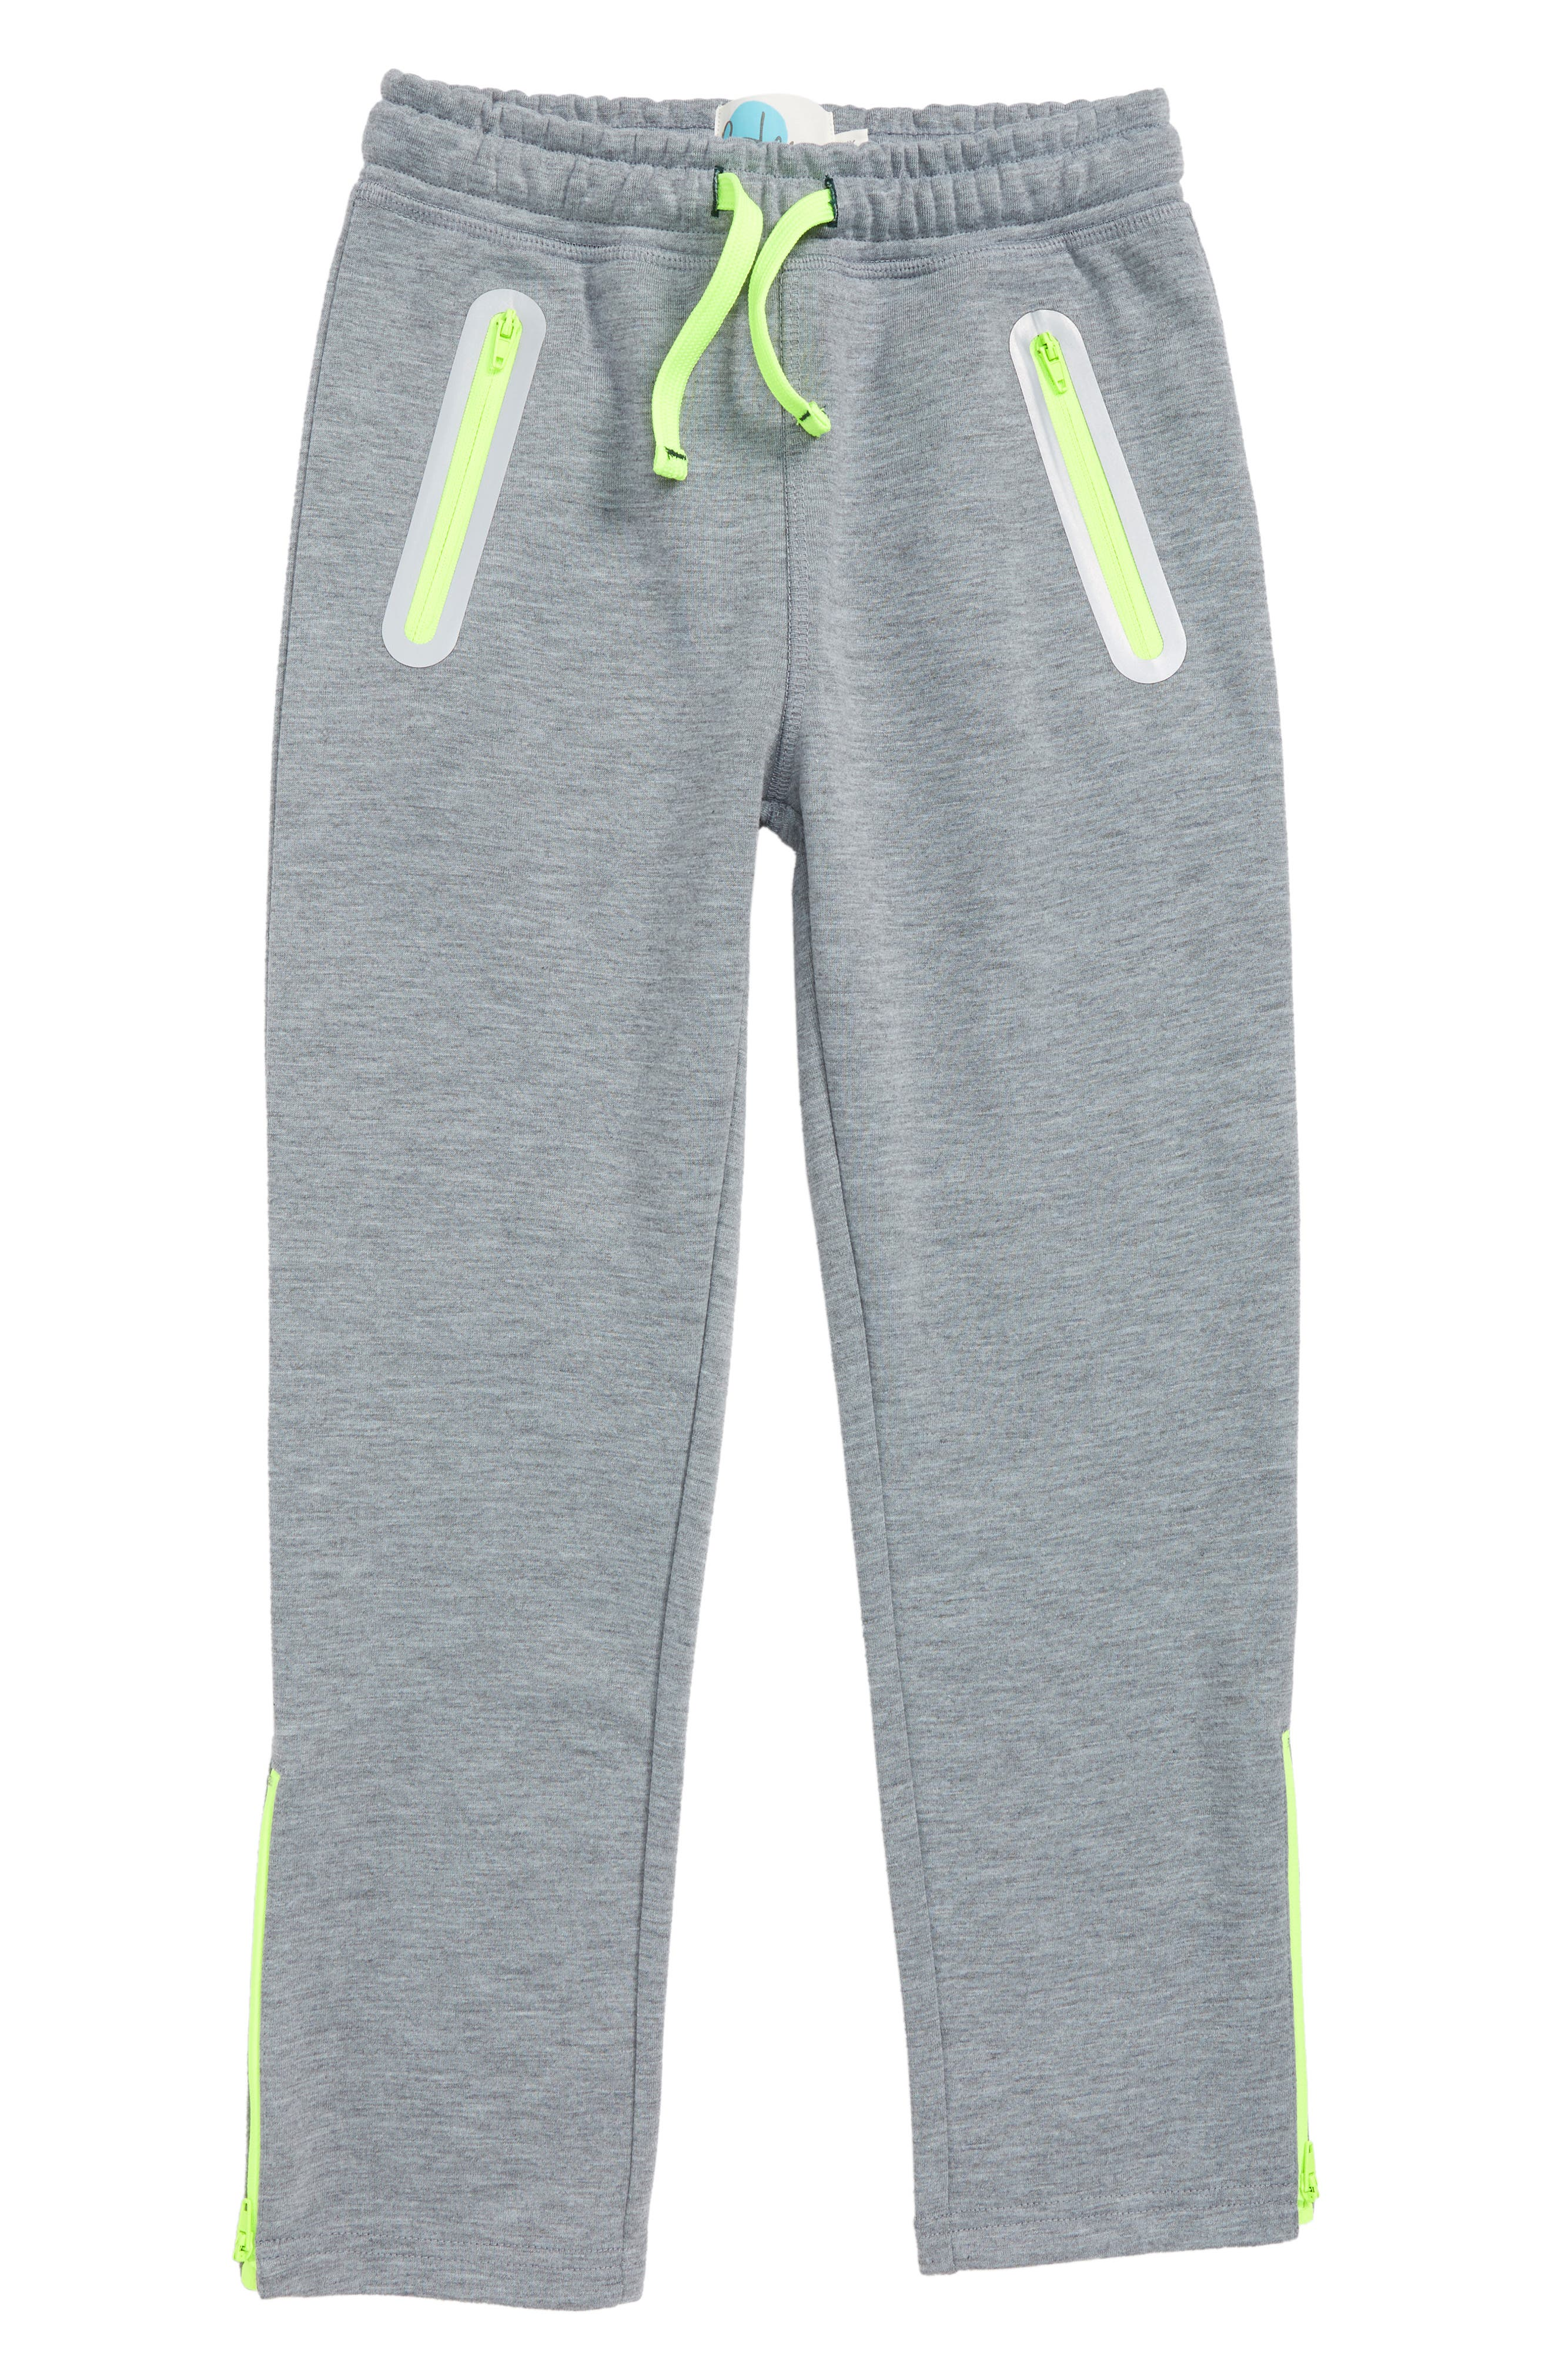 Boys Mini Boden Active Track Pants Size 6Y  Grey